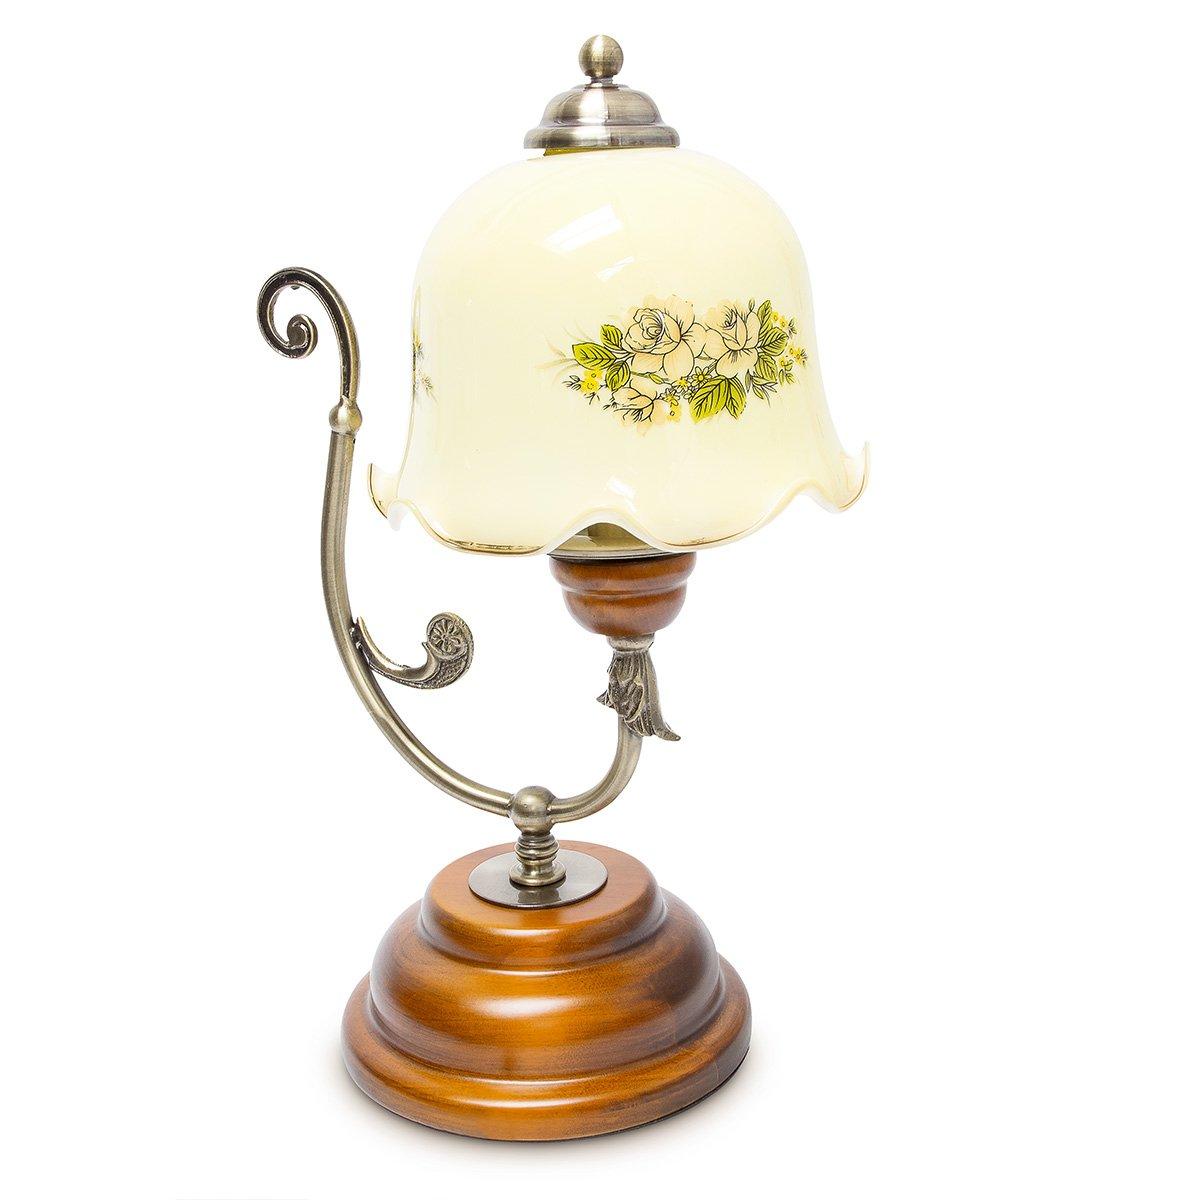 Relaxdays Tischlampe Vintage Shabby Chic Design Holz Metall Glas 10018486